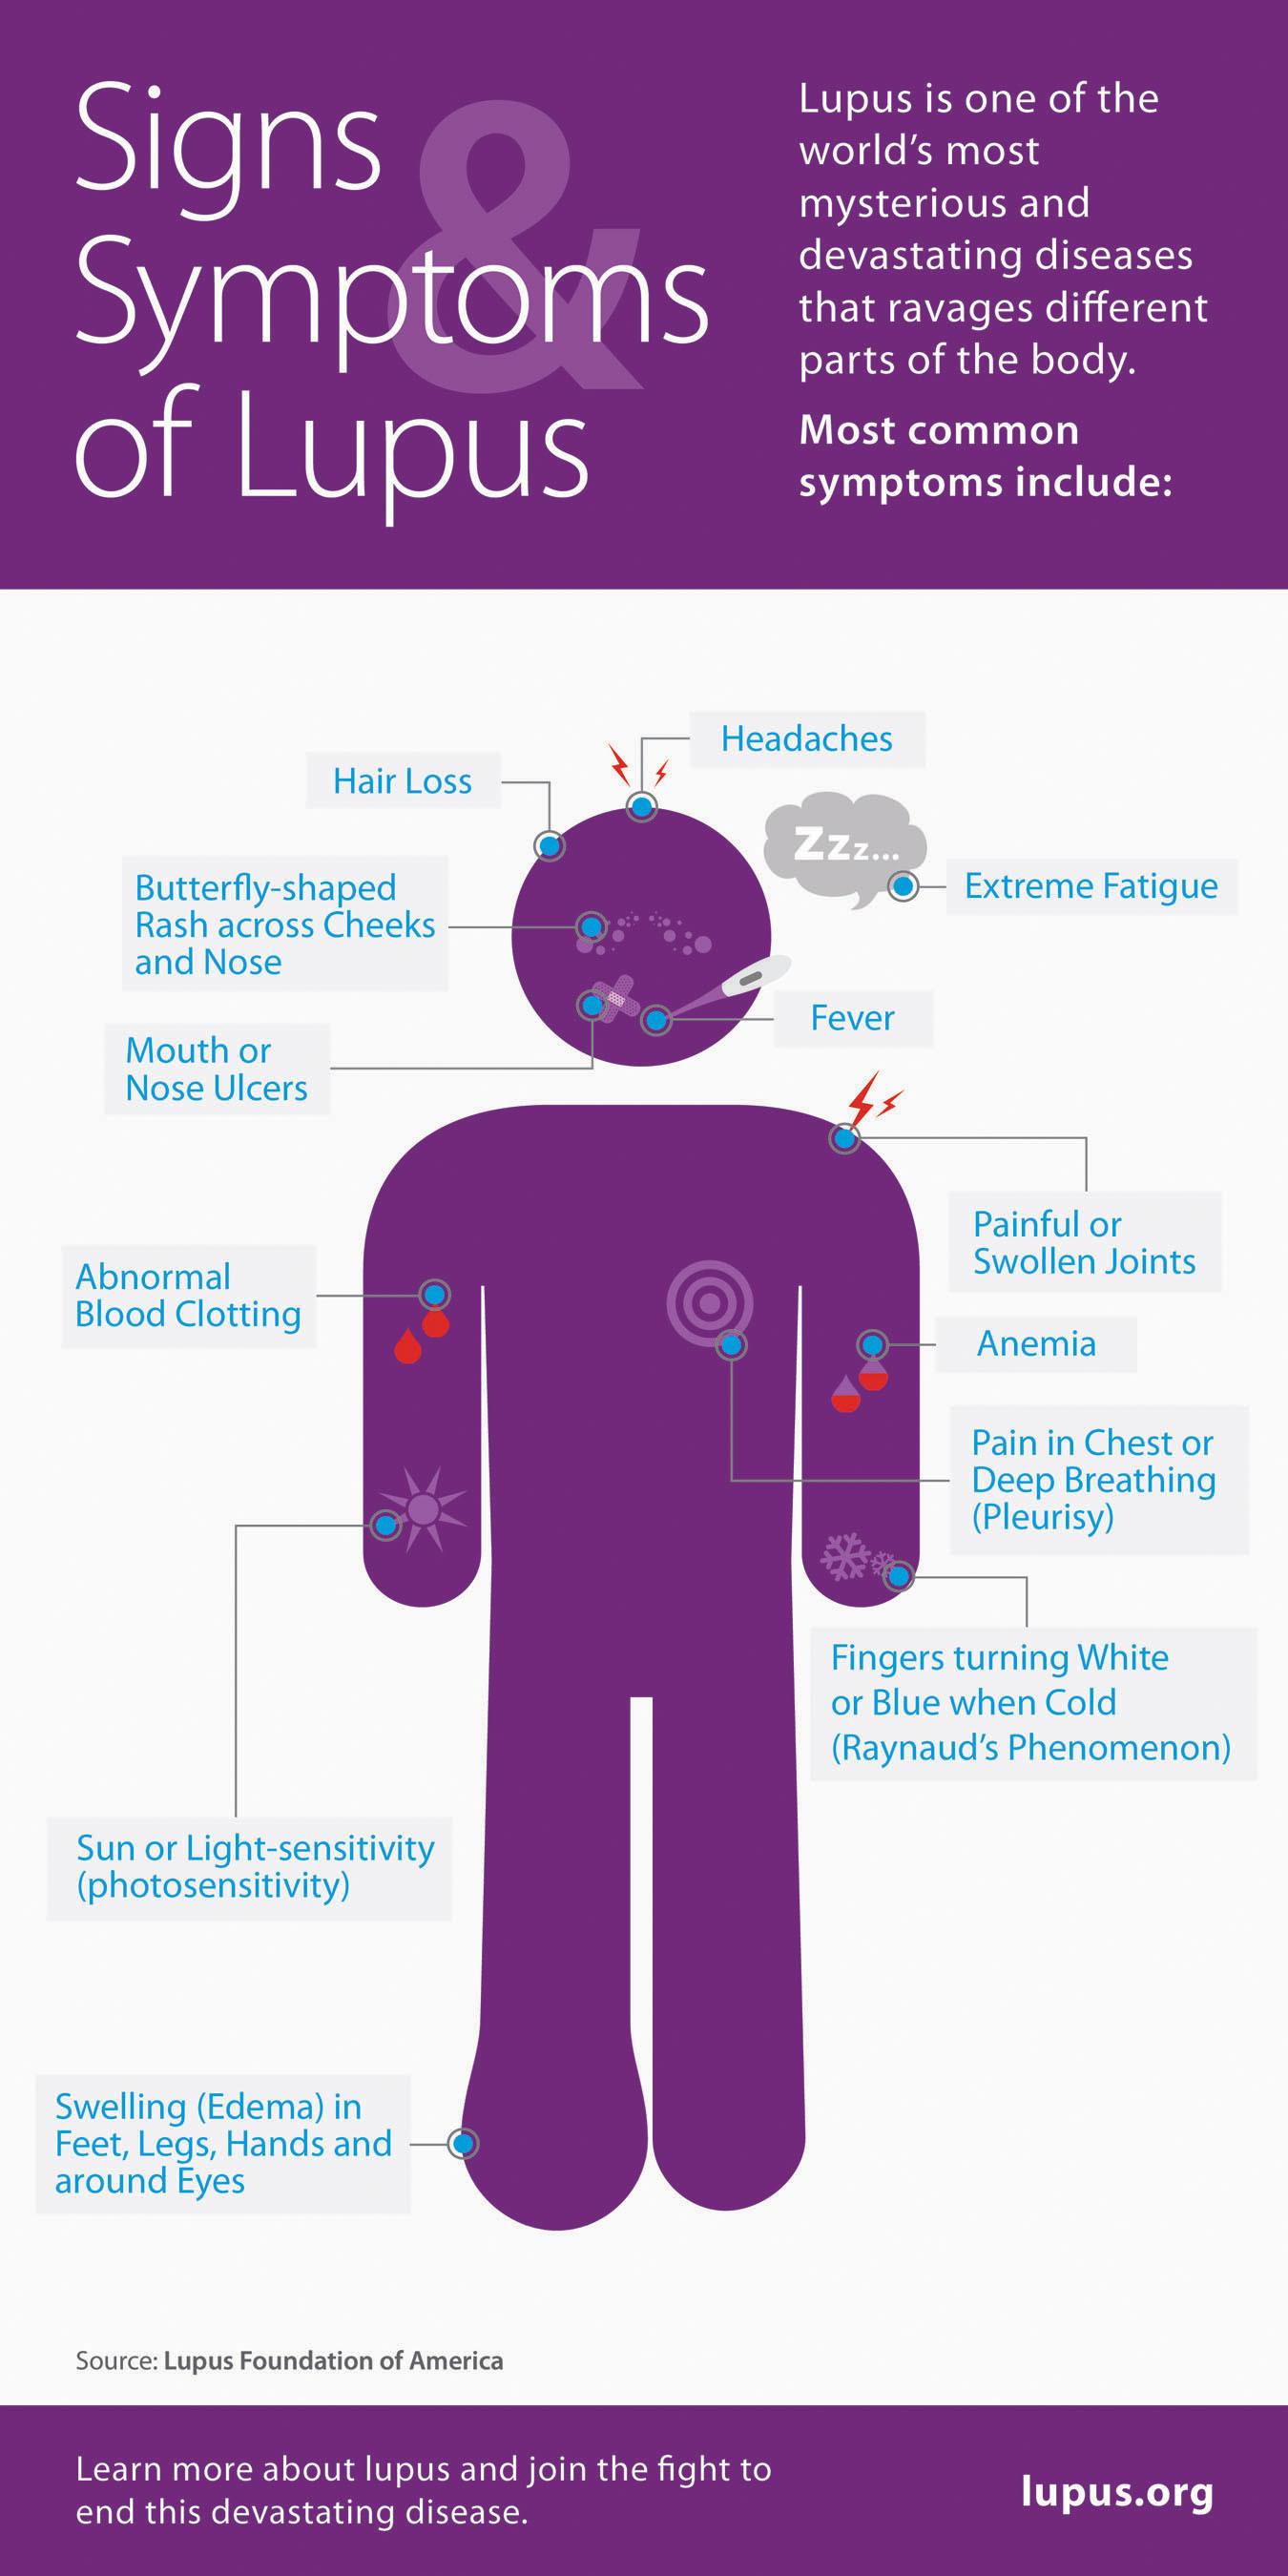 Lupus Signs and Symptoms Infographic.  (PRNewsFoto/Lupus Foundation of America)